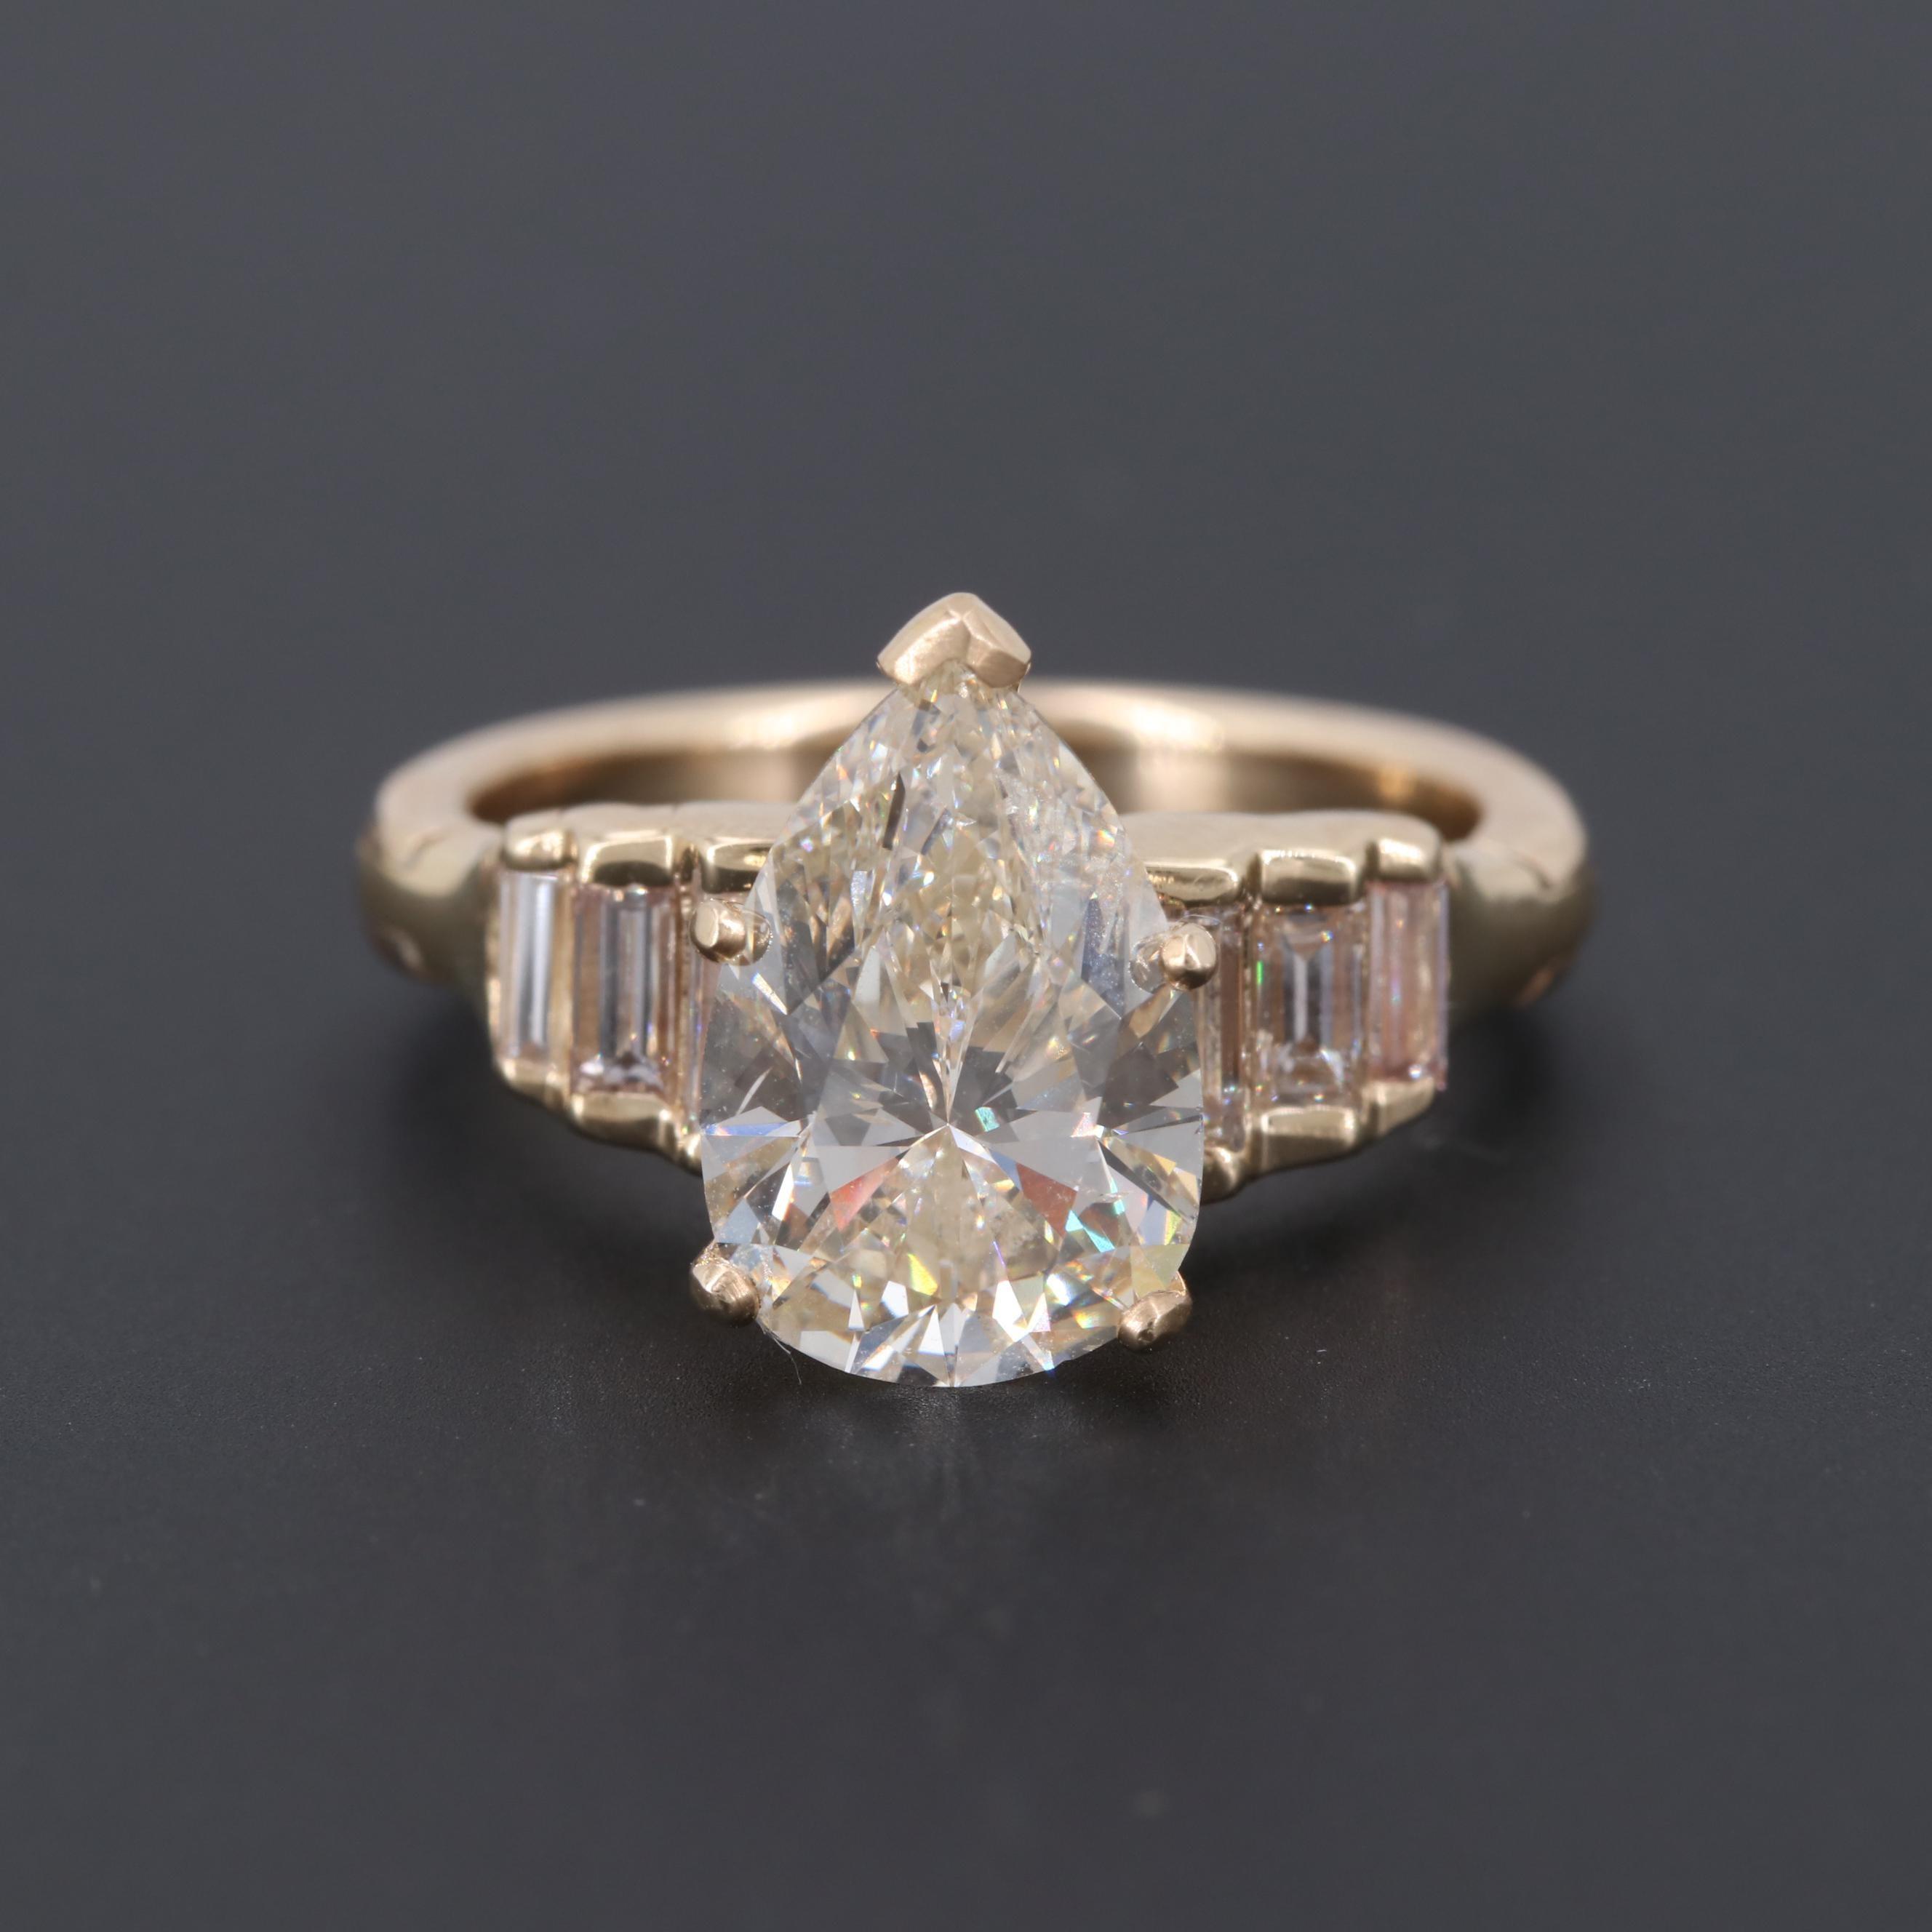 14K Yellow Gold 3.67 CTW Diamond Ring with Arthritic Shank